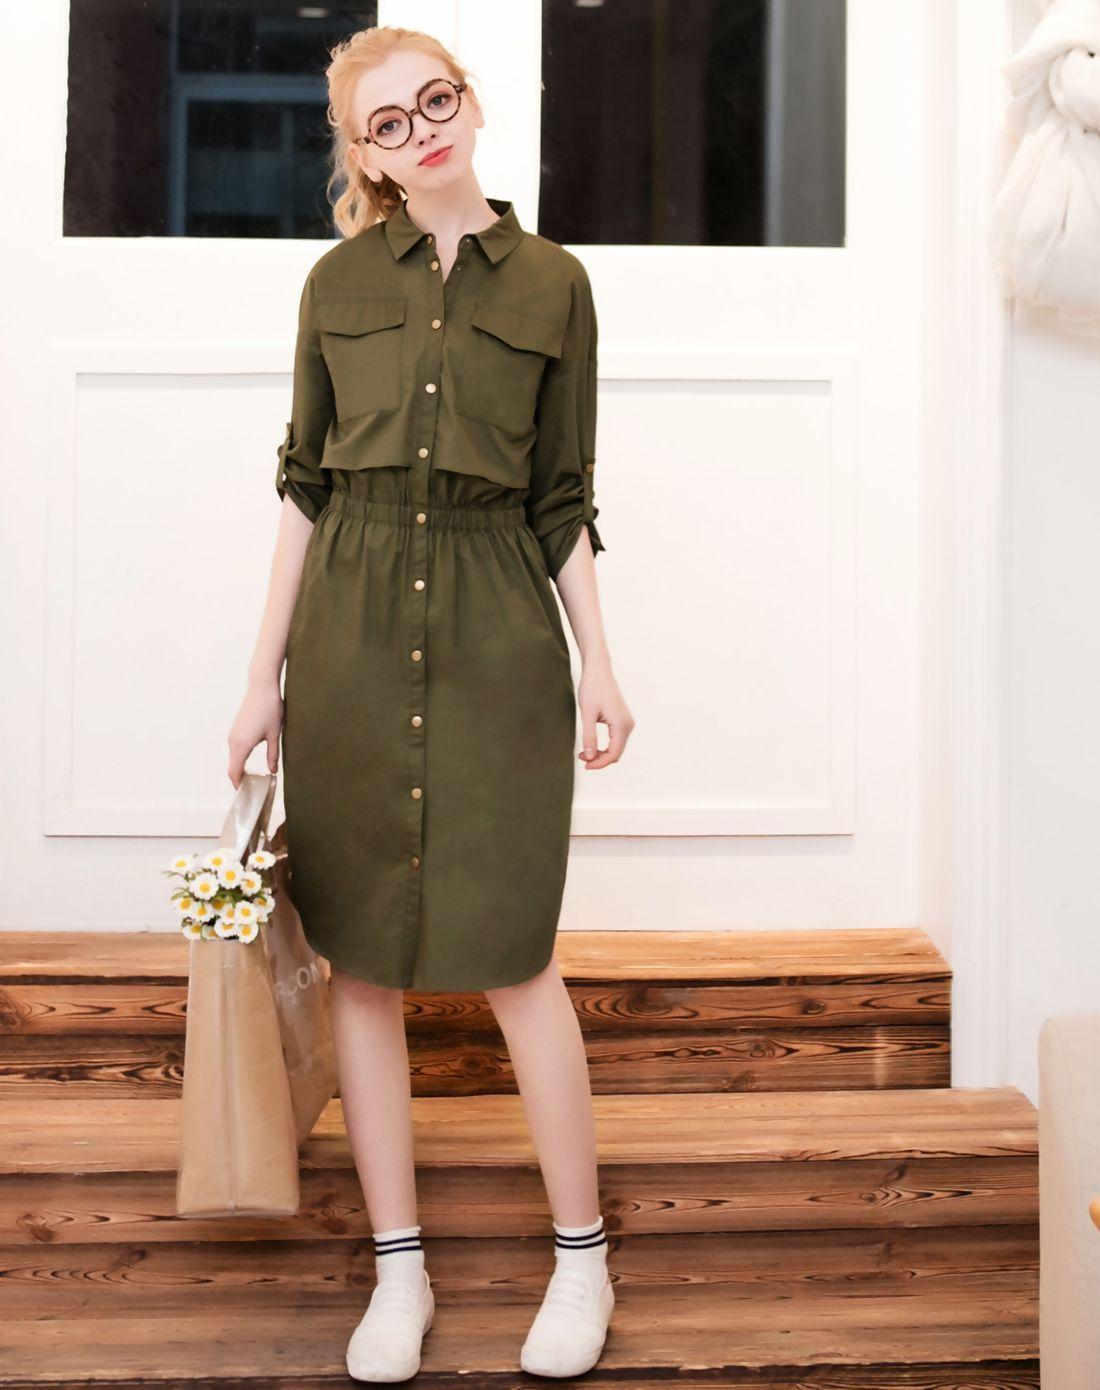 Adorewe vipme shirt dressesdesigner qigirl military green snap